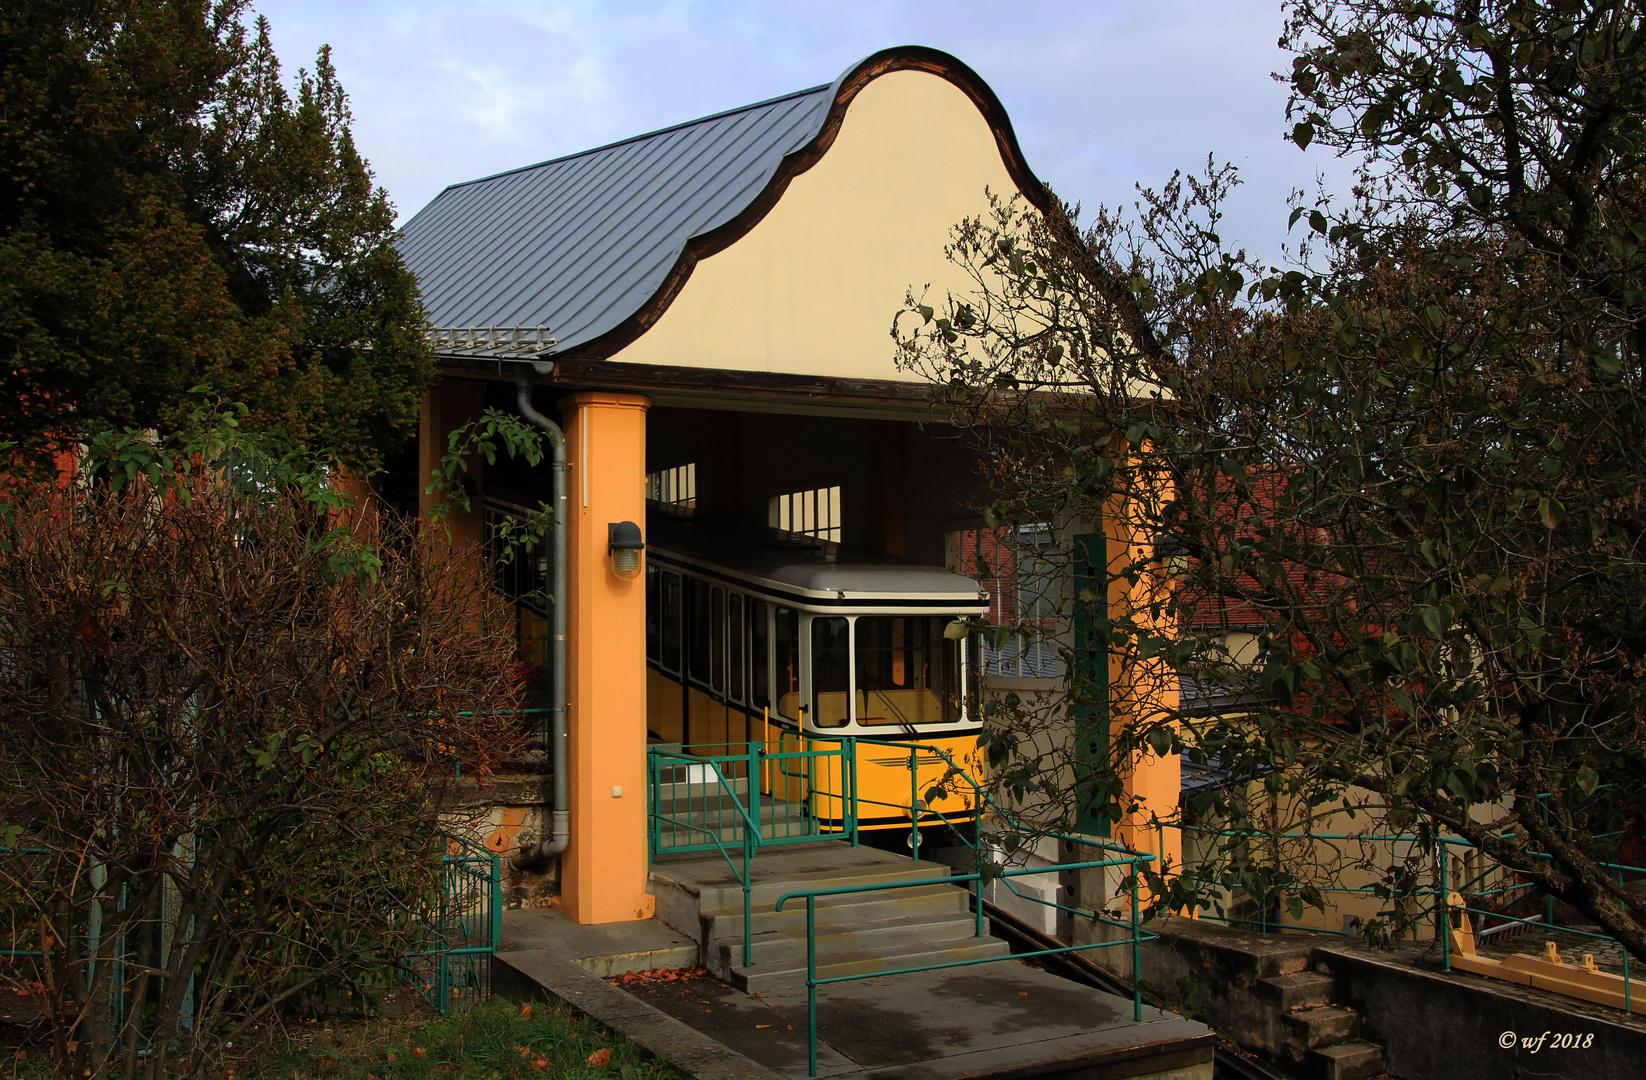 Haltestelle Bergstation